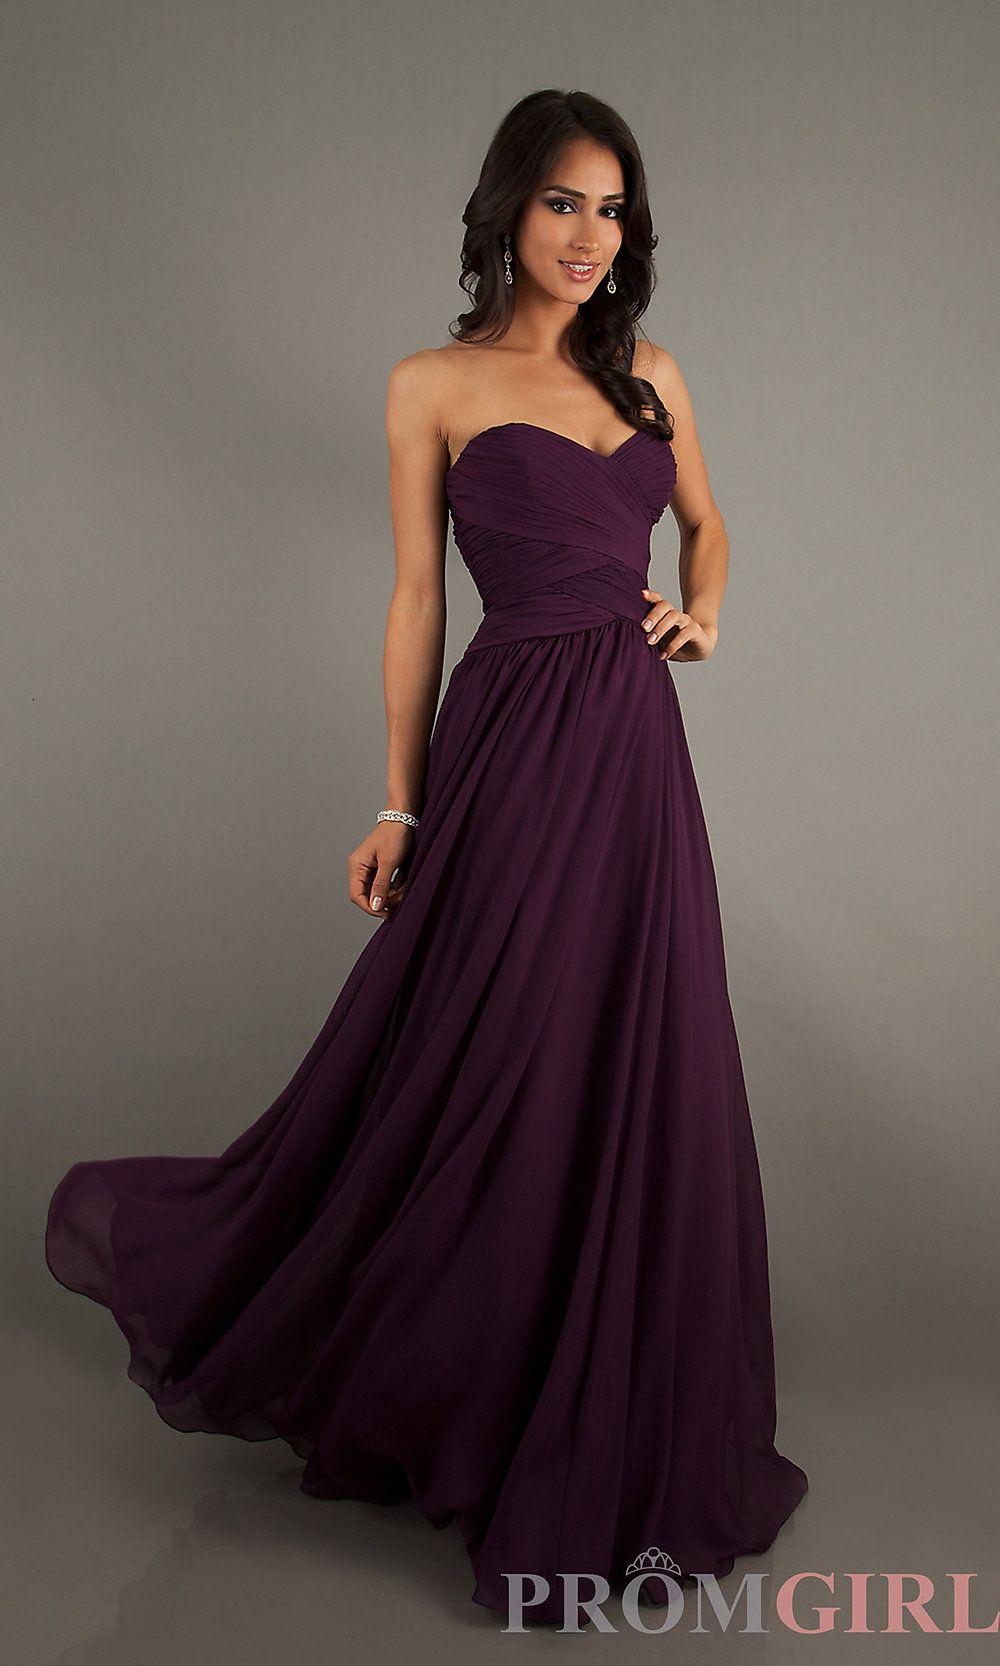 Eggplant Bridesmaid Dress Love This Color